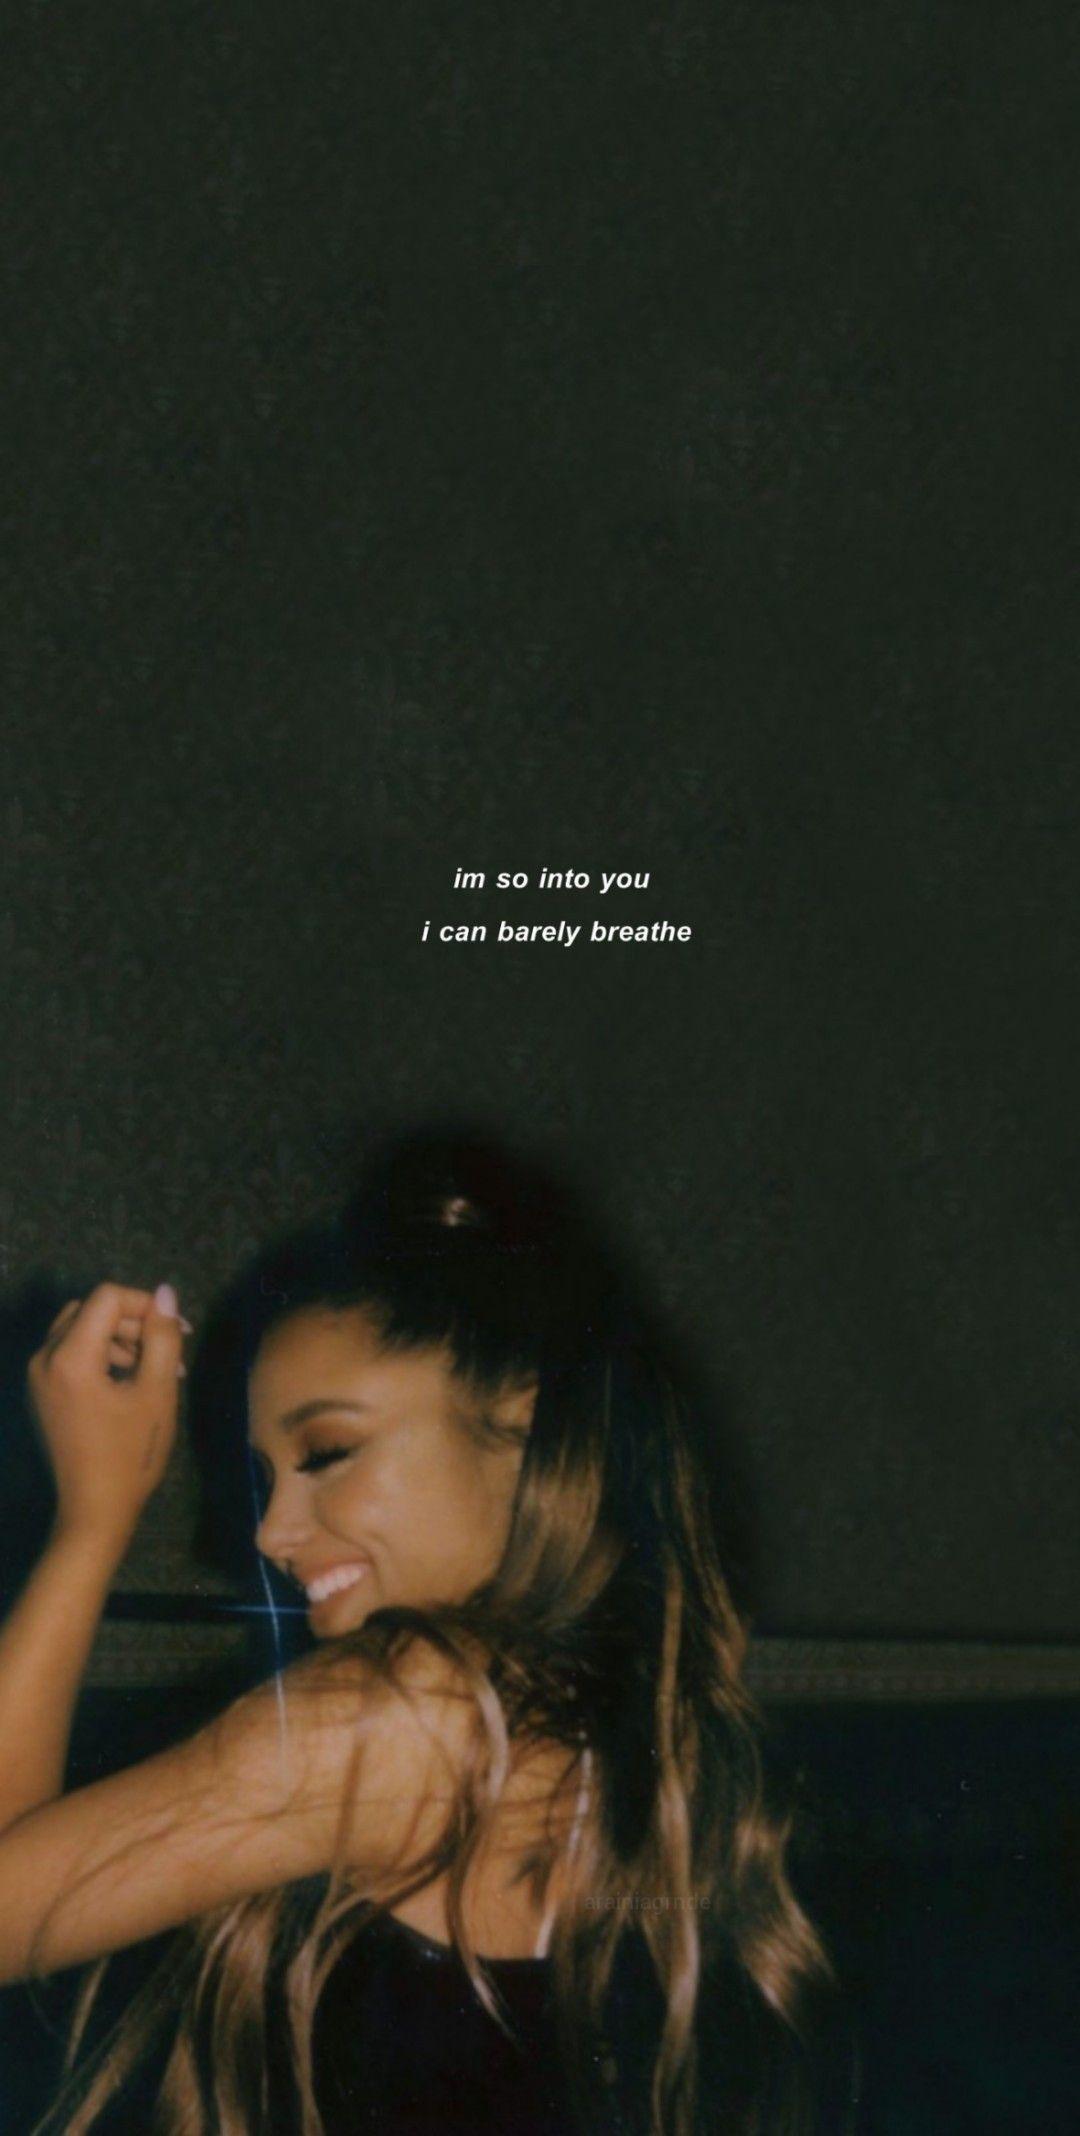 Pin Na Doske Ariana Wallpapers